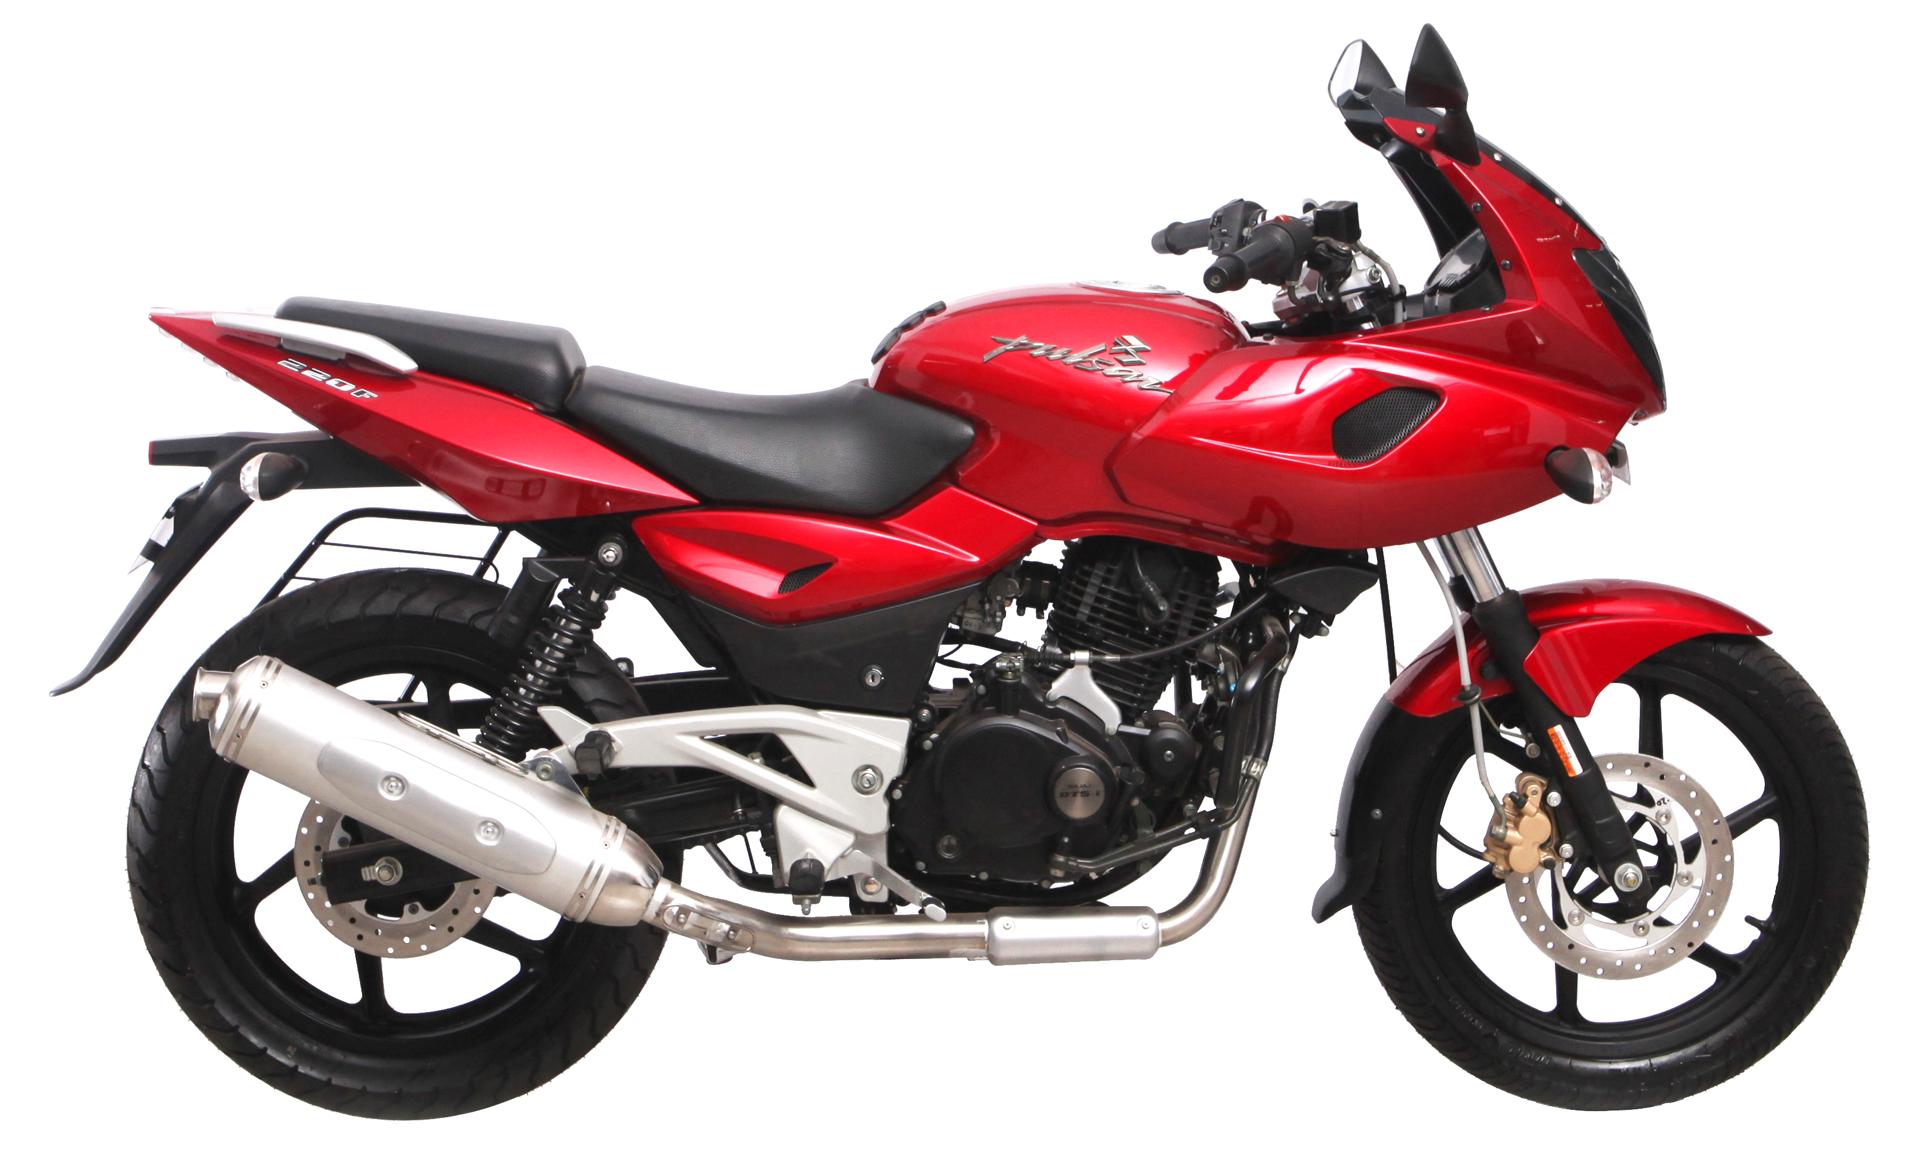 Bajaj Pulsar 220 Motorcycle Bike PNG Image.